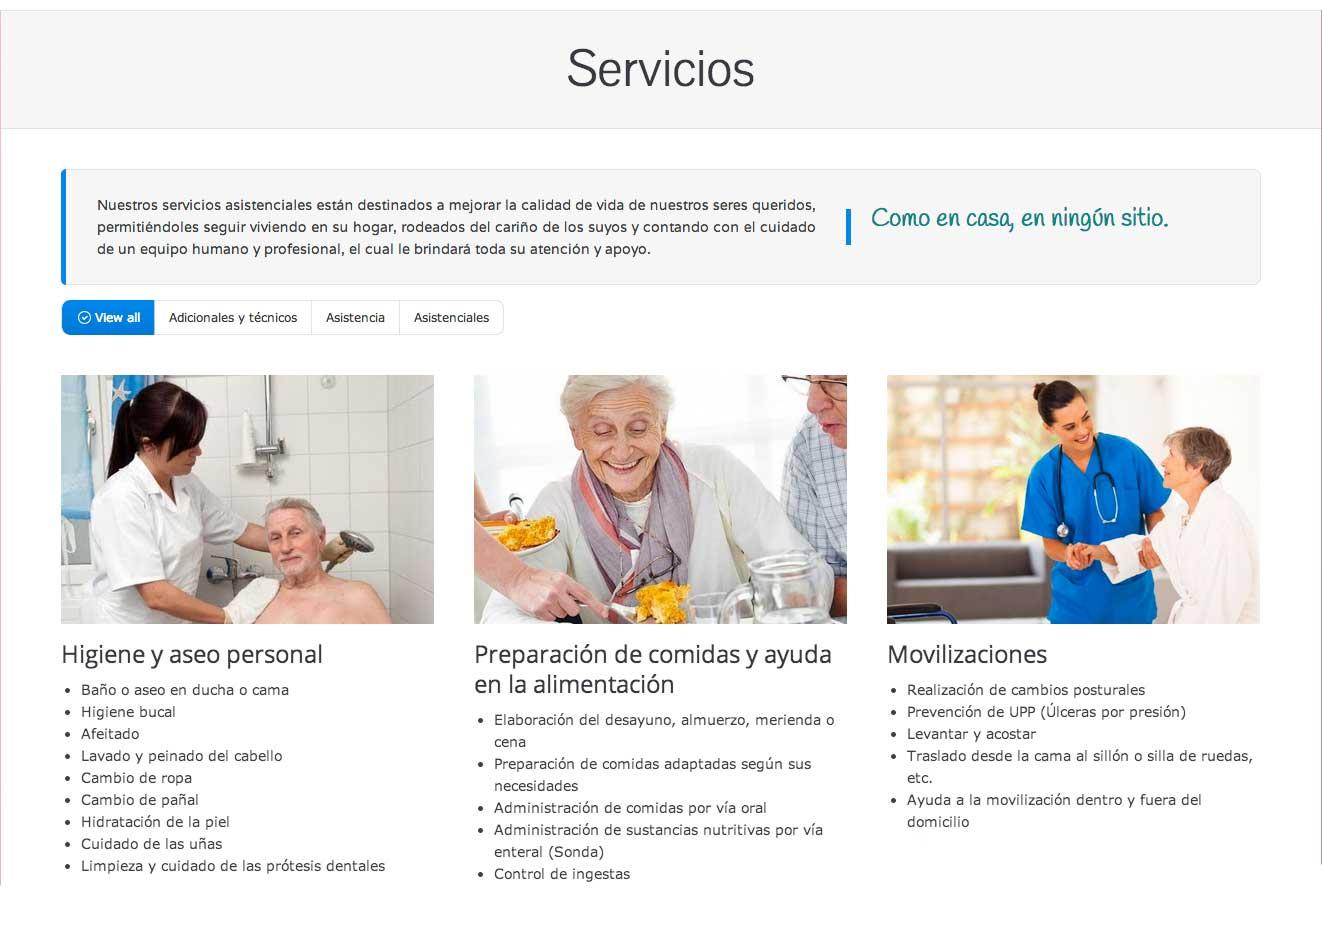 Marbella web design. Auxiliary nursing services